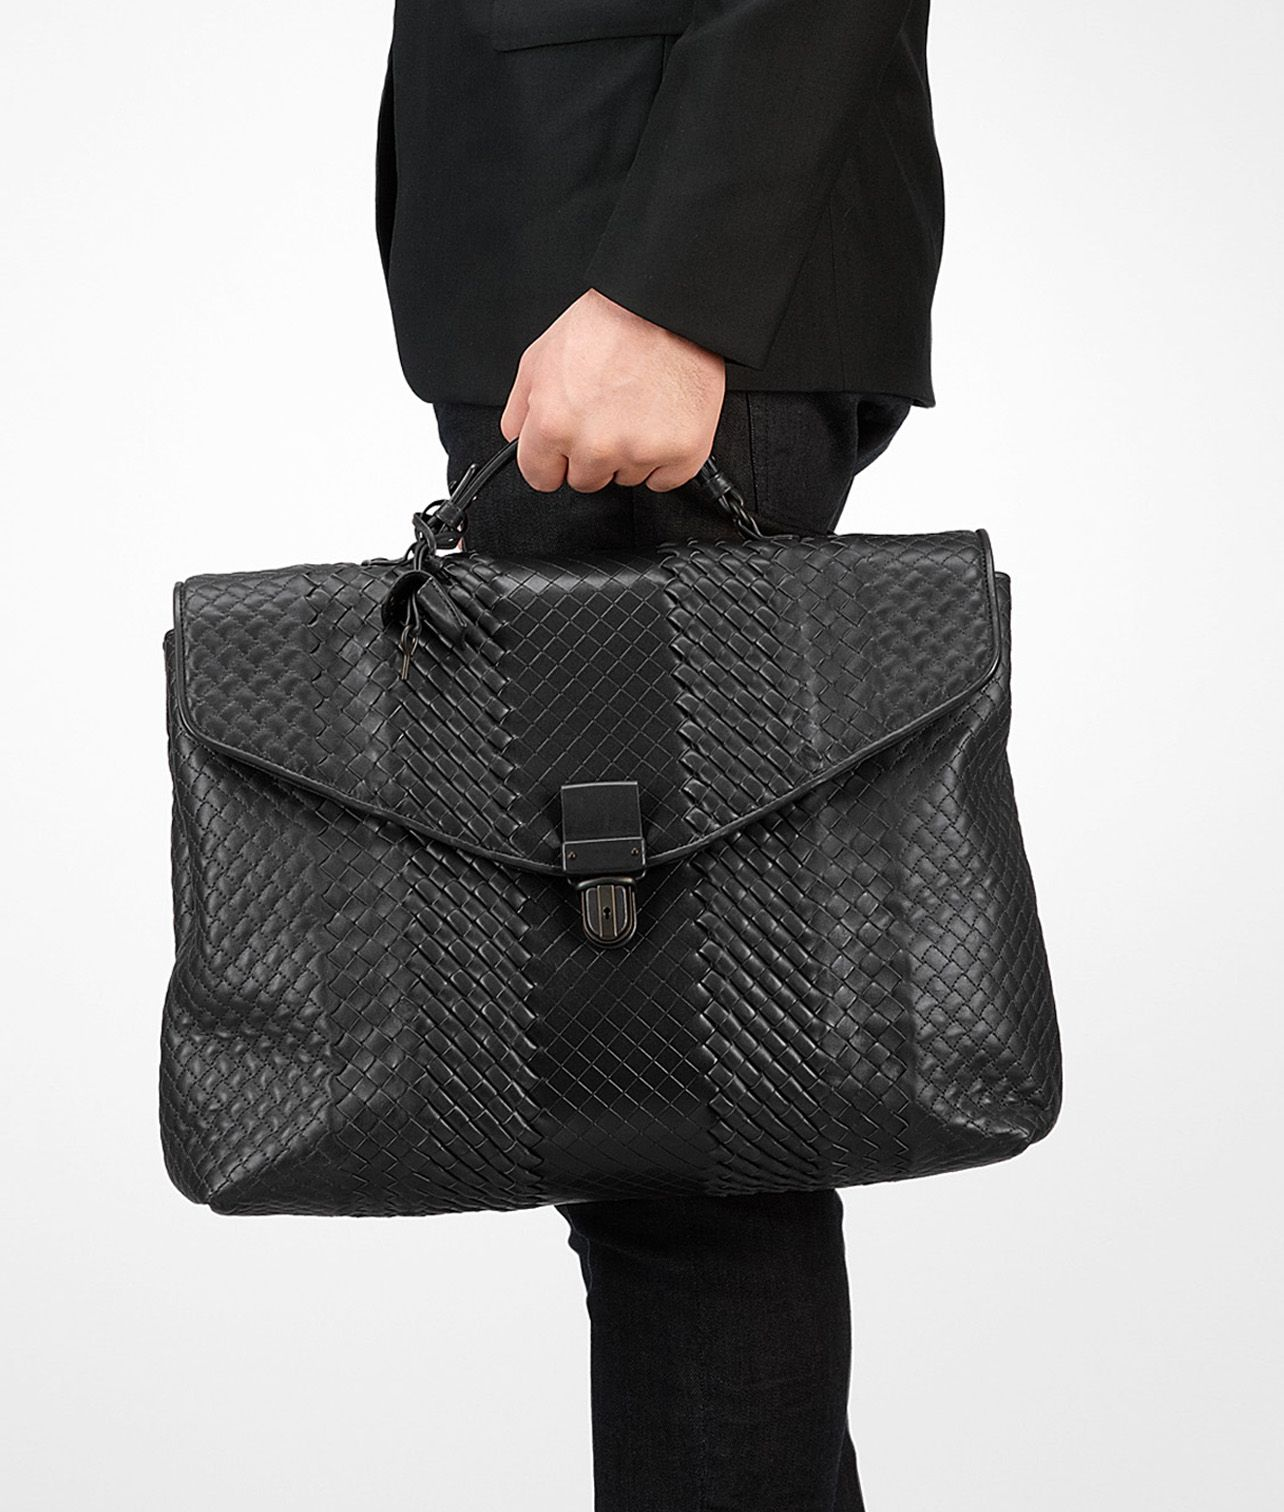 fdcb32132fc3 Shop Bottega Veneta® Men s Nero Intreccio Imperatore Briefcase. Discover  more details about the item.